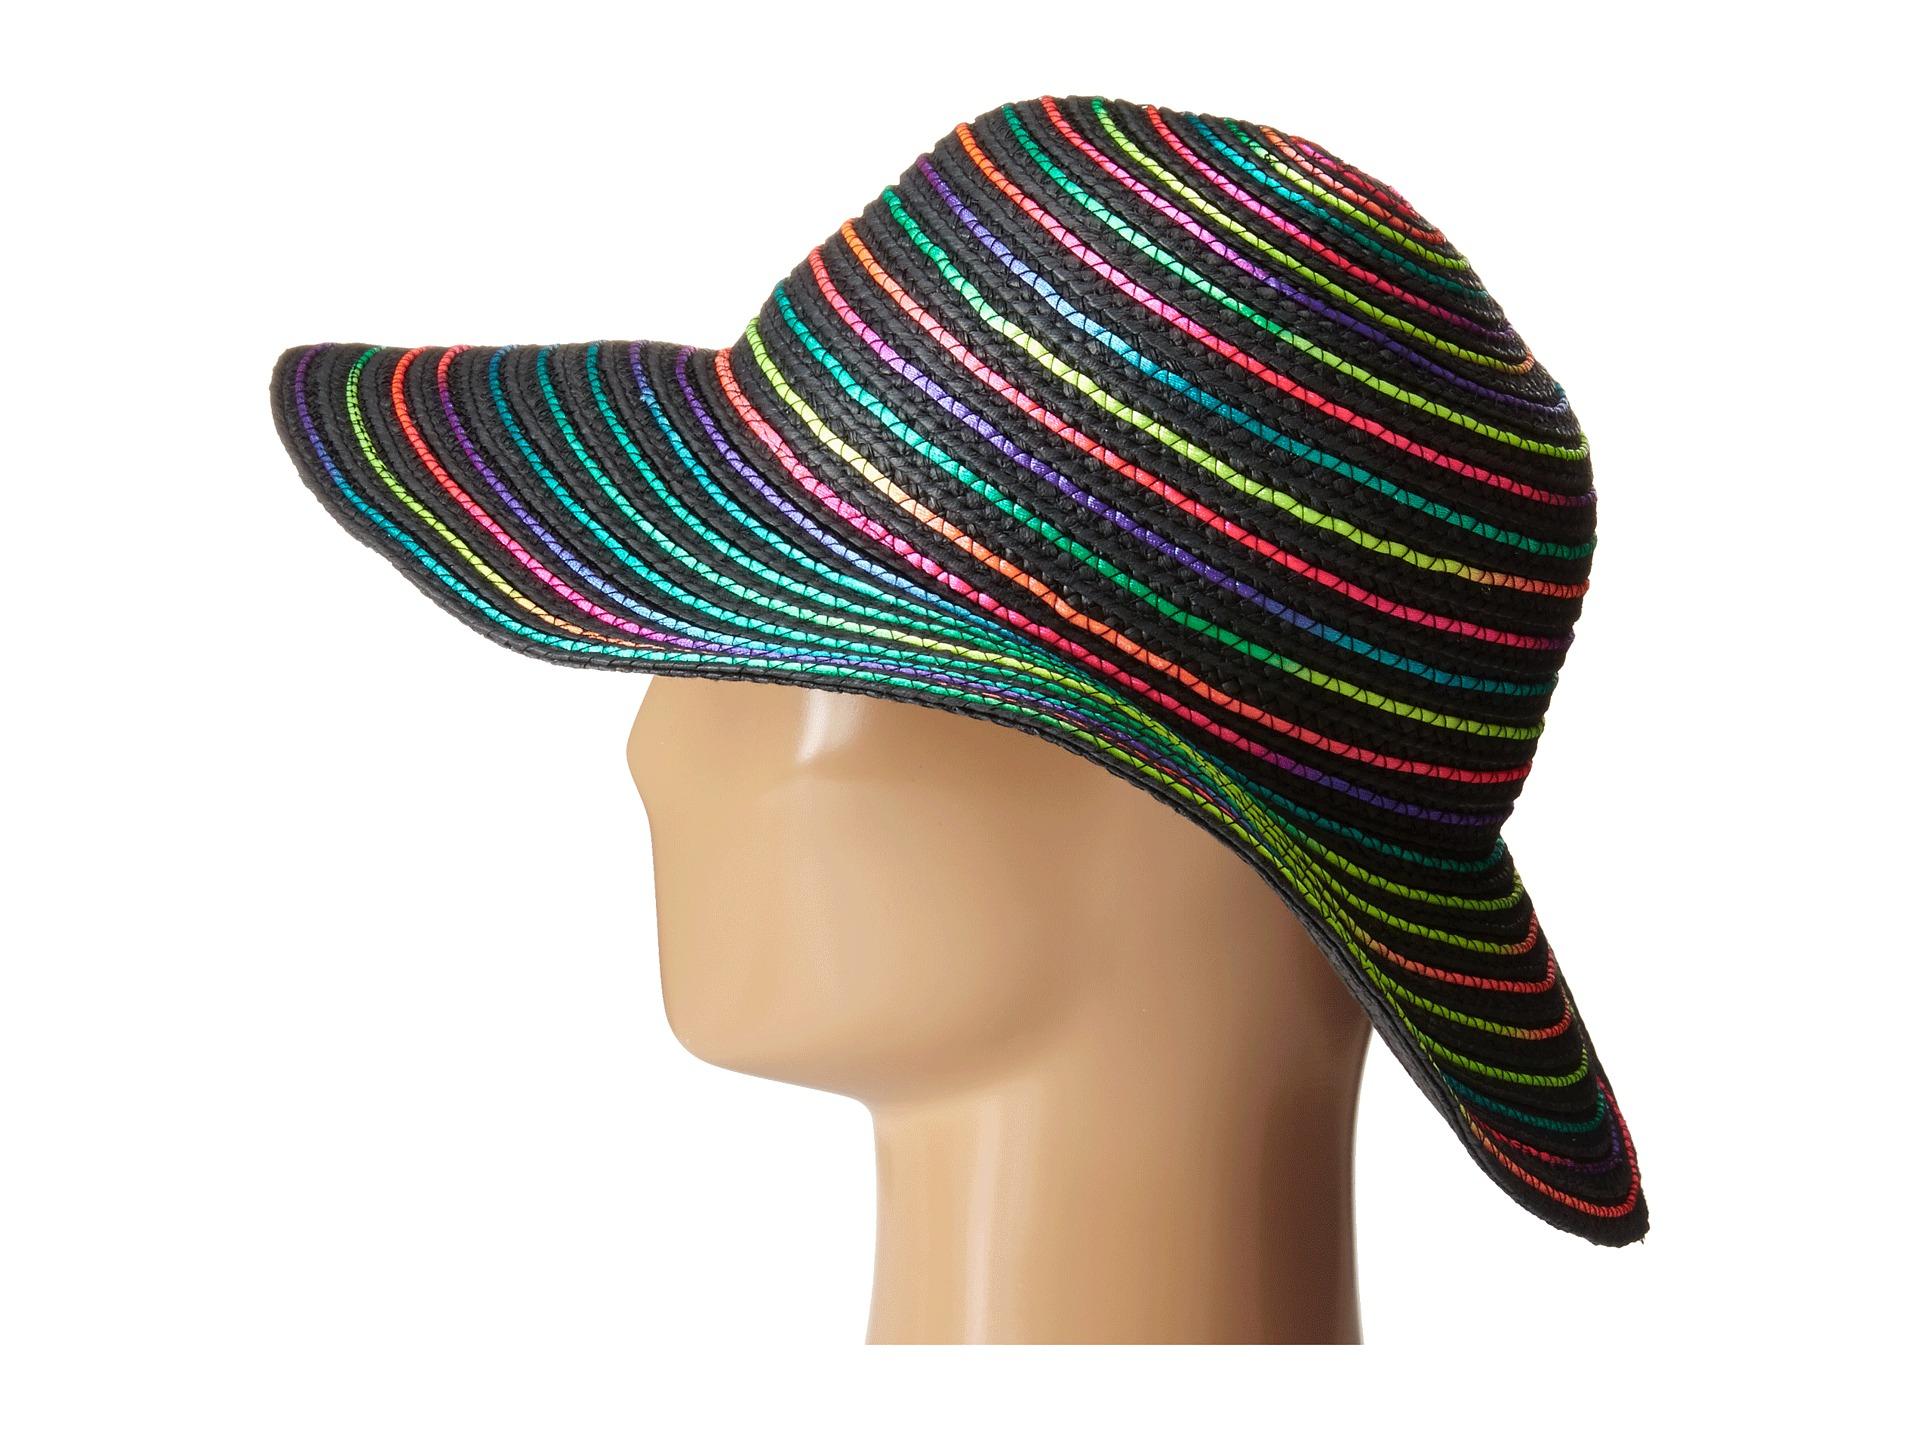 d8d98721ebd Lyst - Betsey Johnson Rainbow Swirl Floppy Hat in Gray